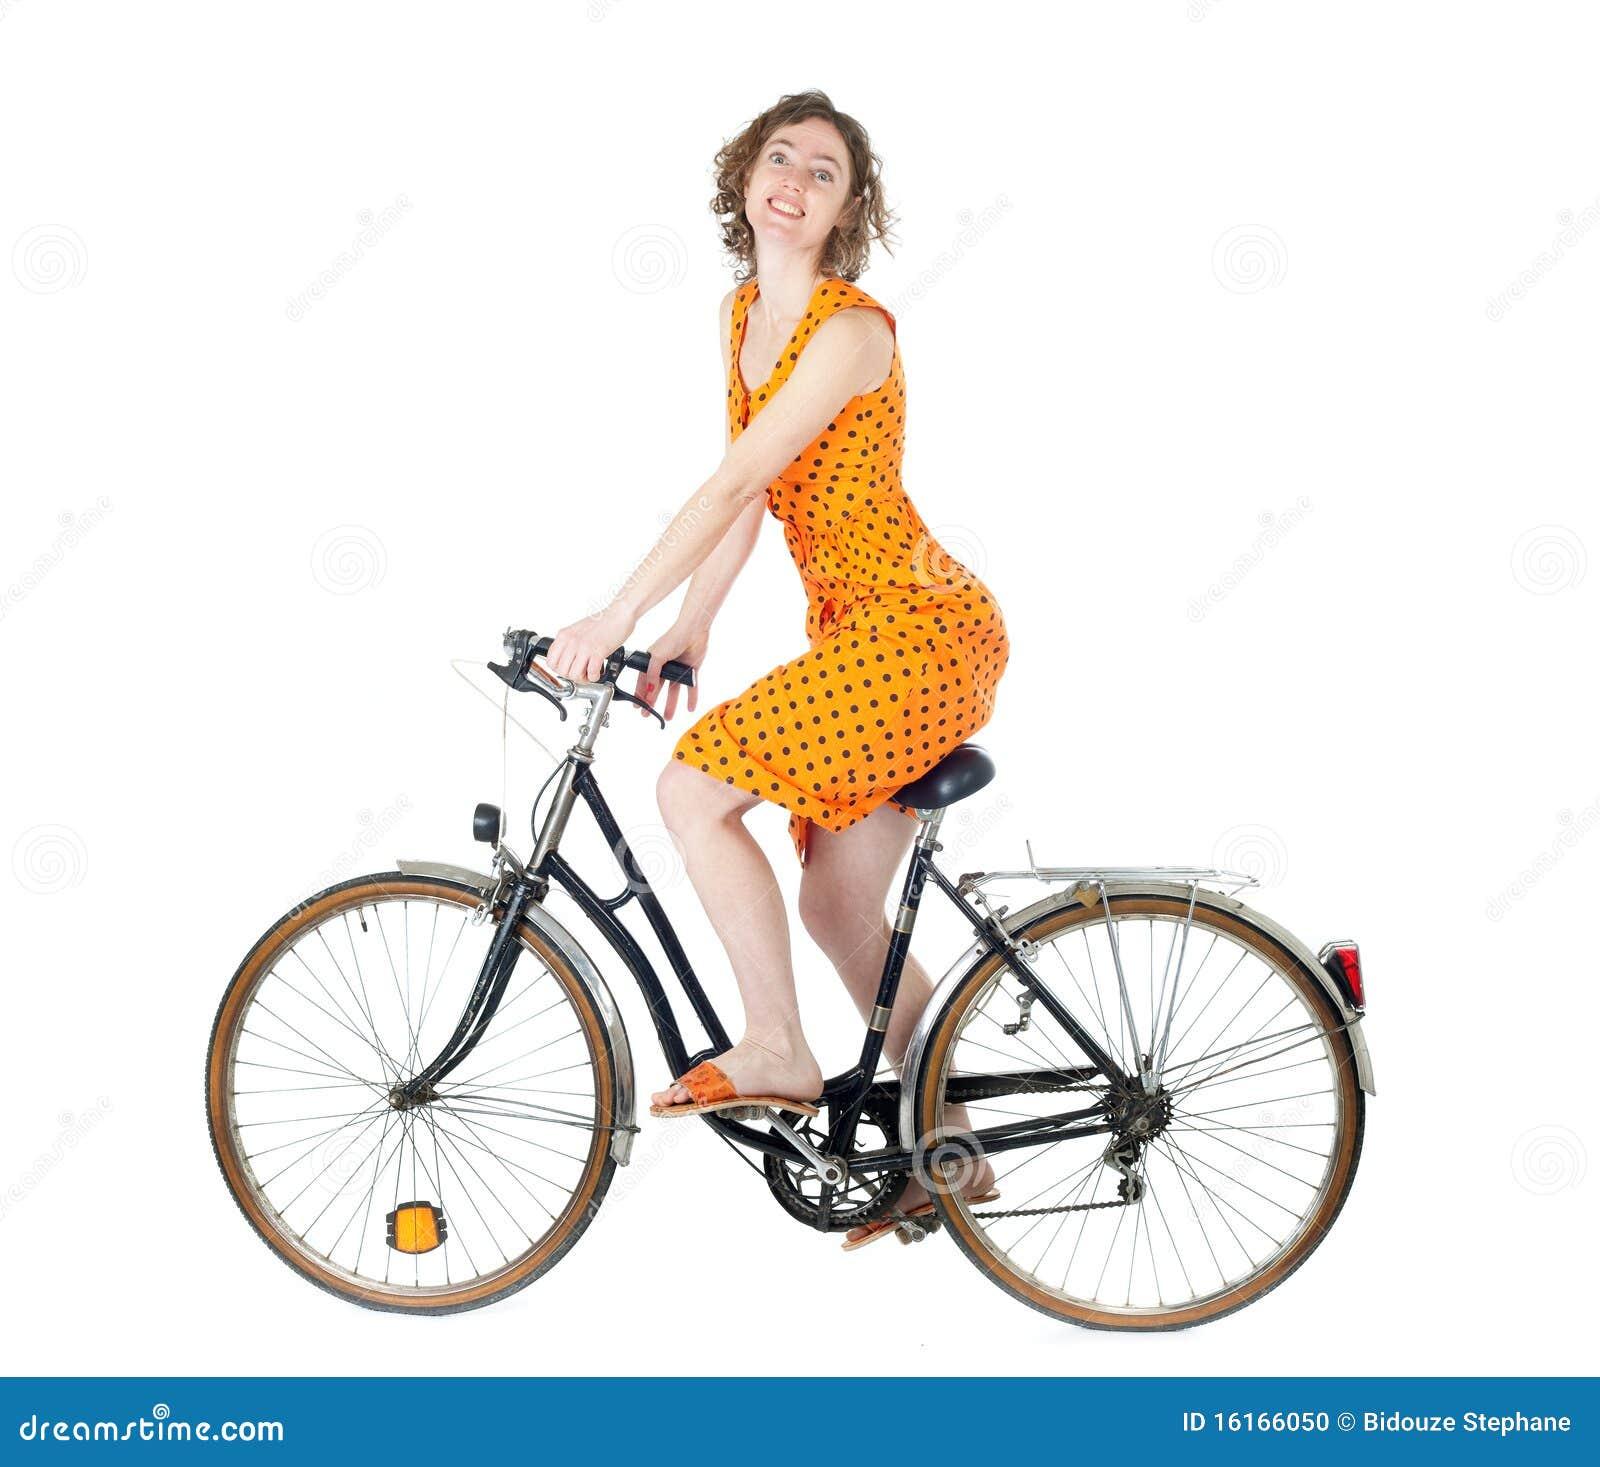 frau auf fahrrad stockfoto bild 16166050. Black Bedroom Furniture Sets. Home Design Ideas